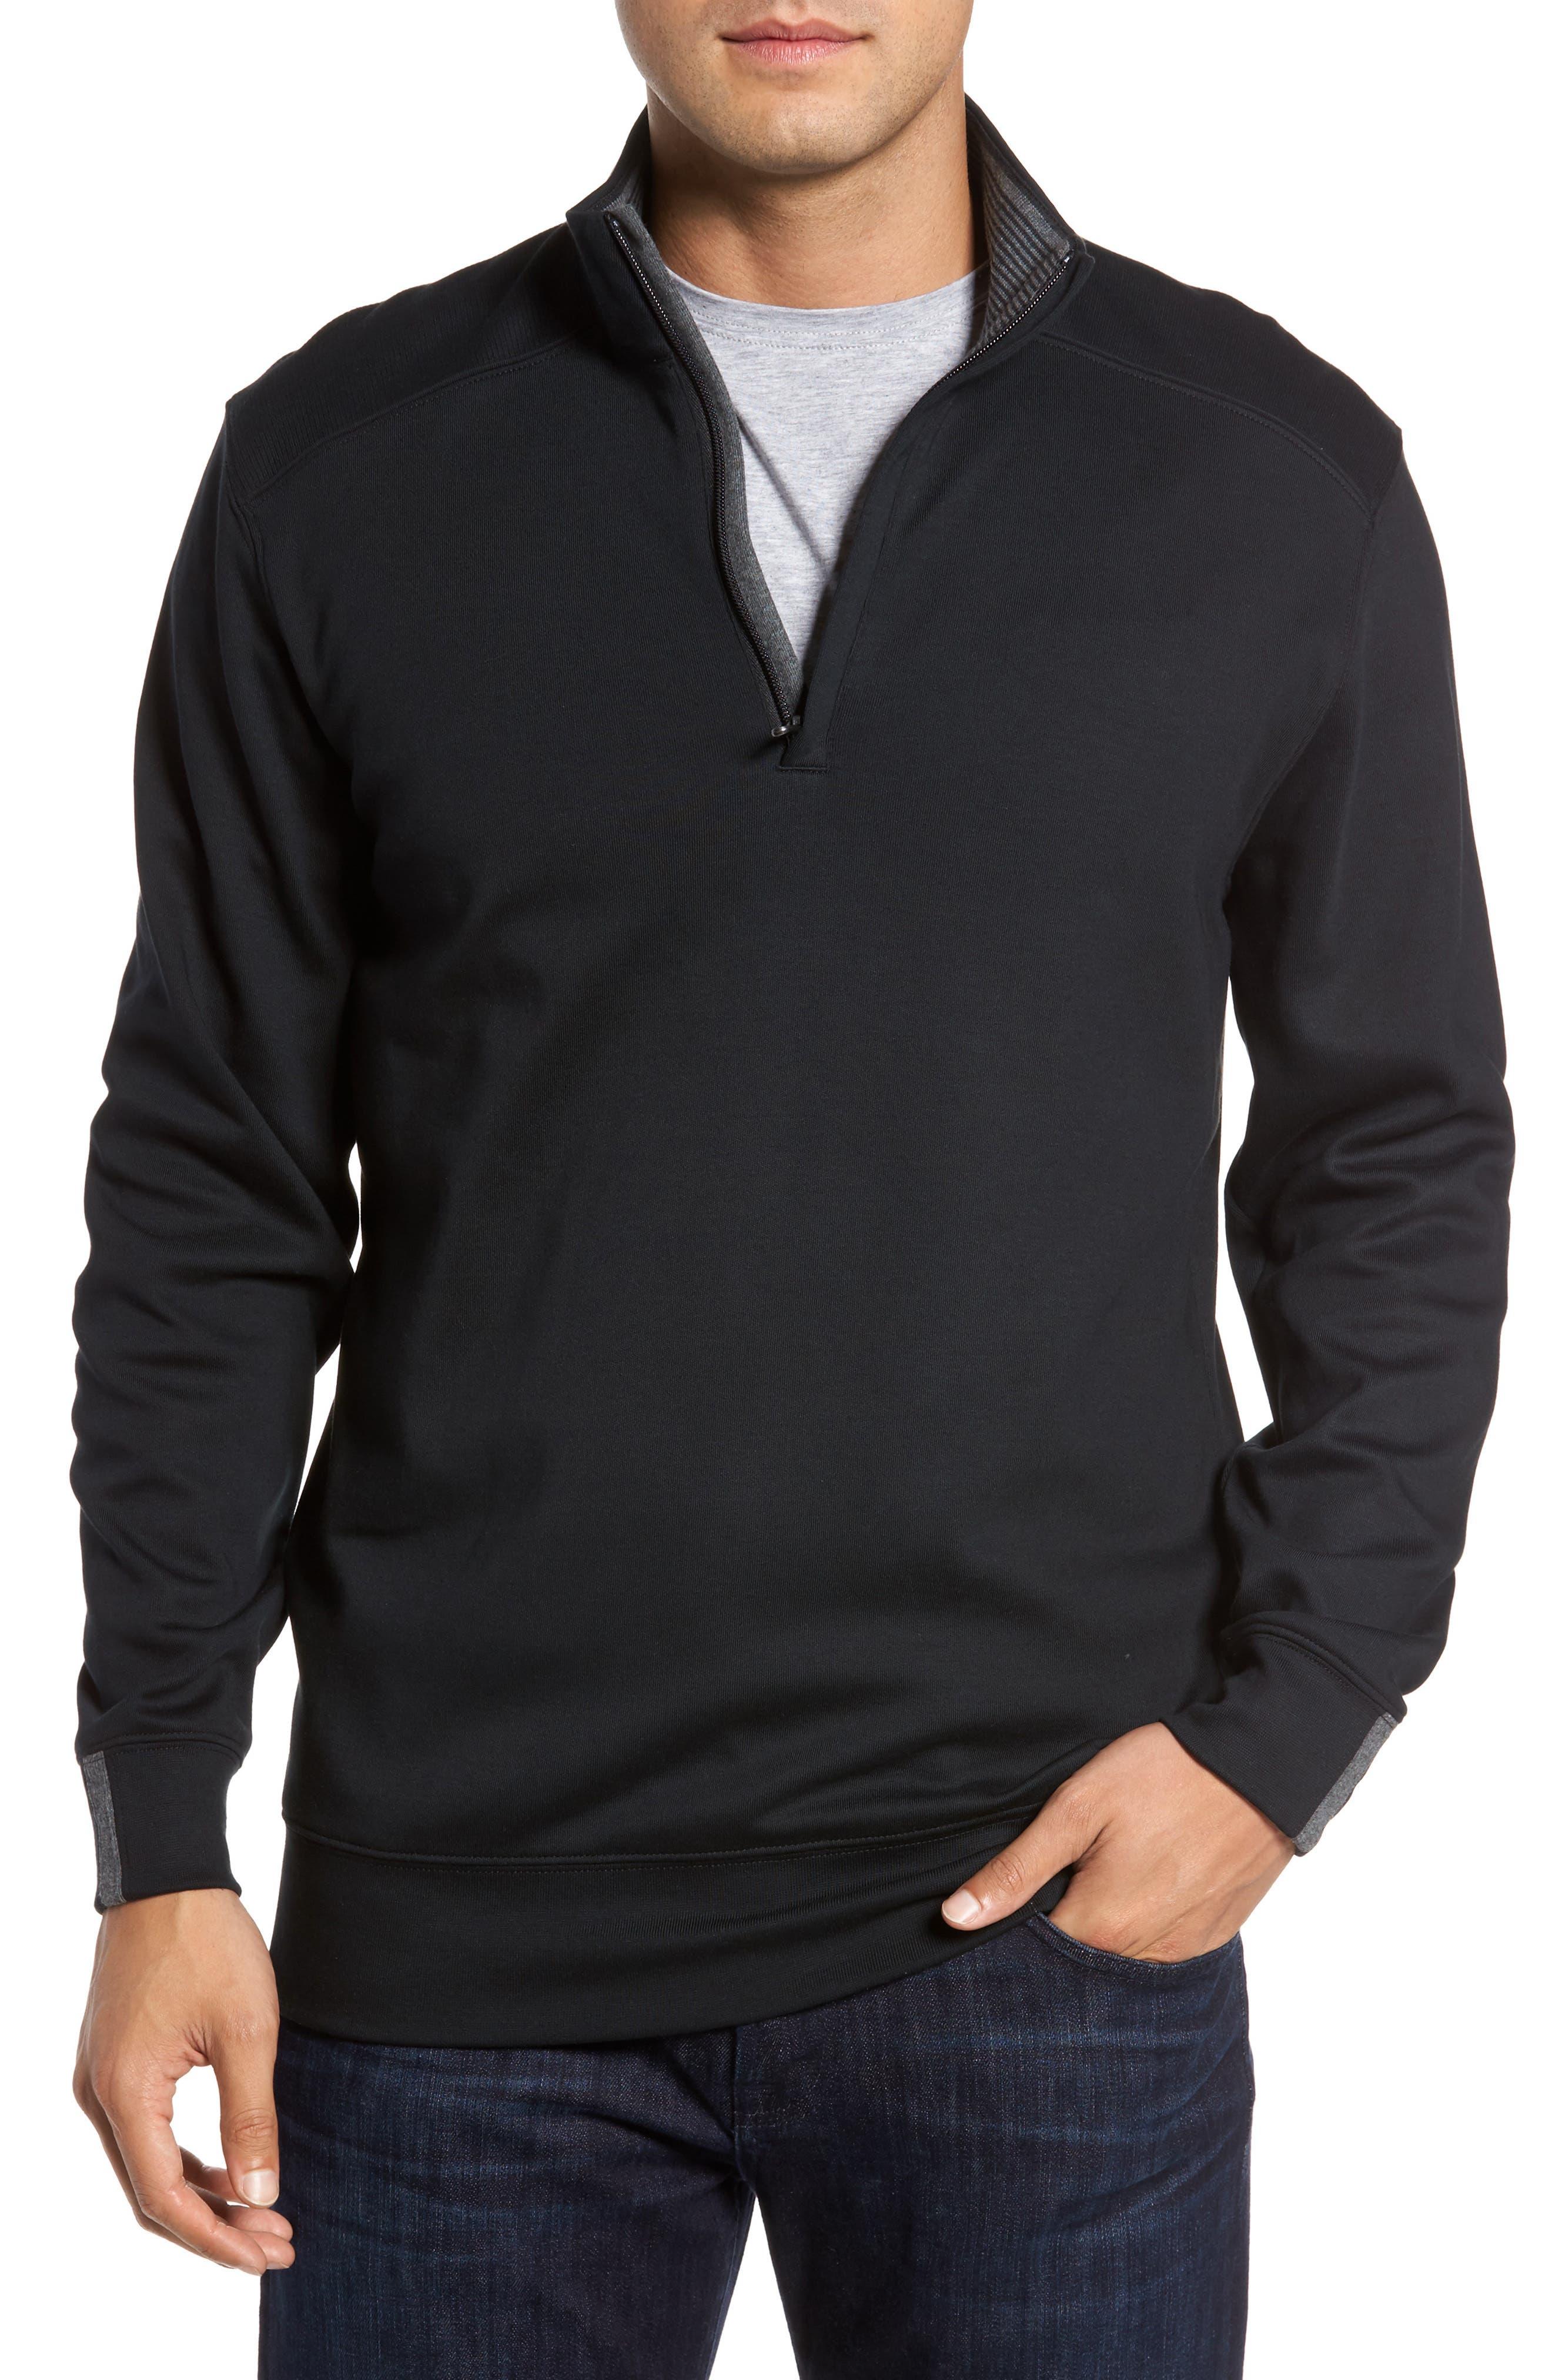 BOBBY JONES, 'New Leaderboard' Quarter Zip Pullover, Main thumbnail 1, color, BLACK